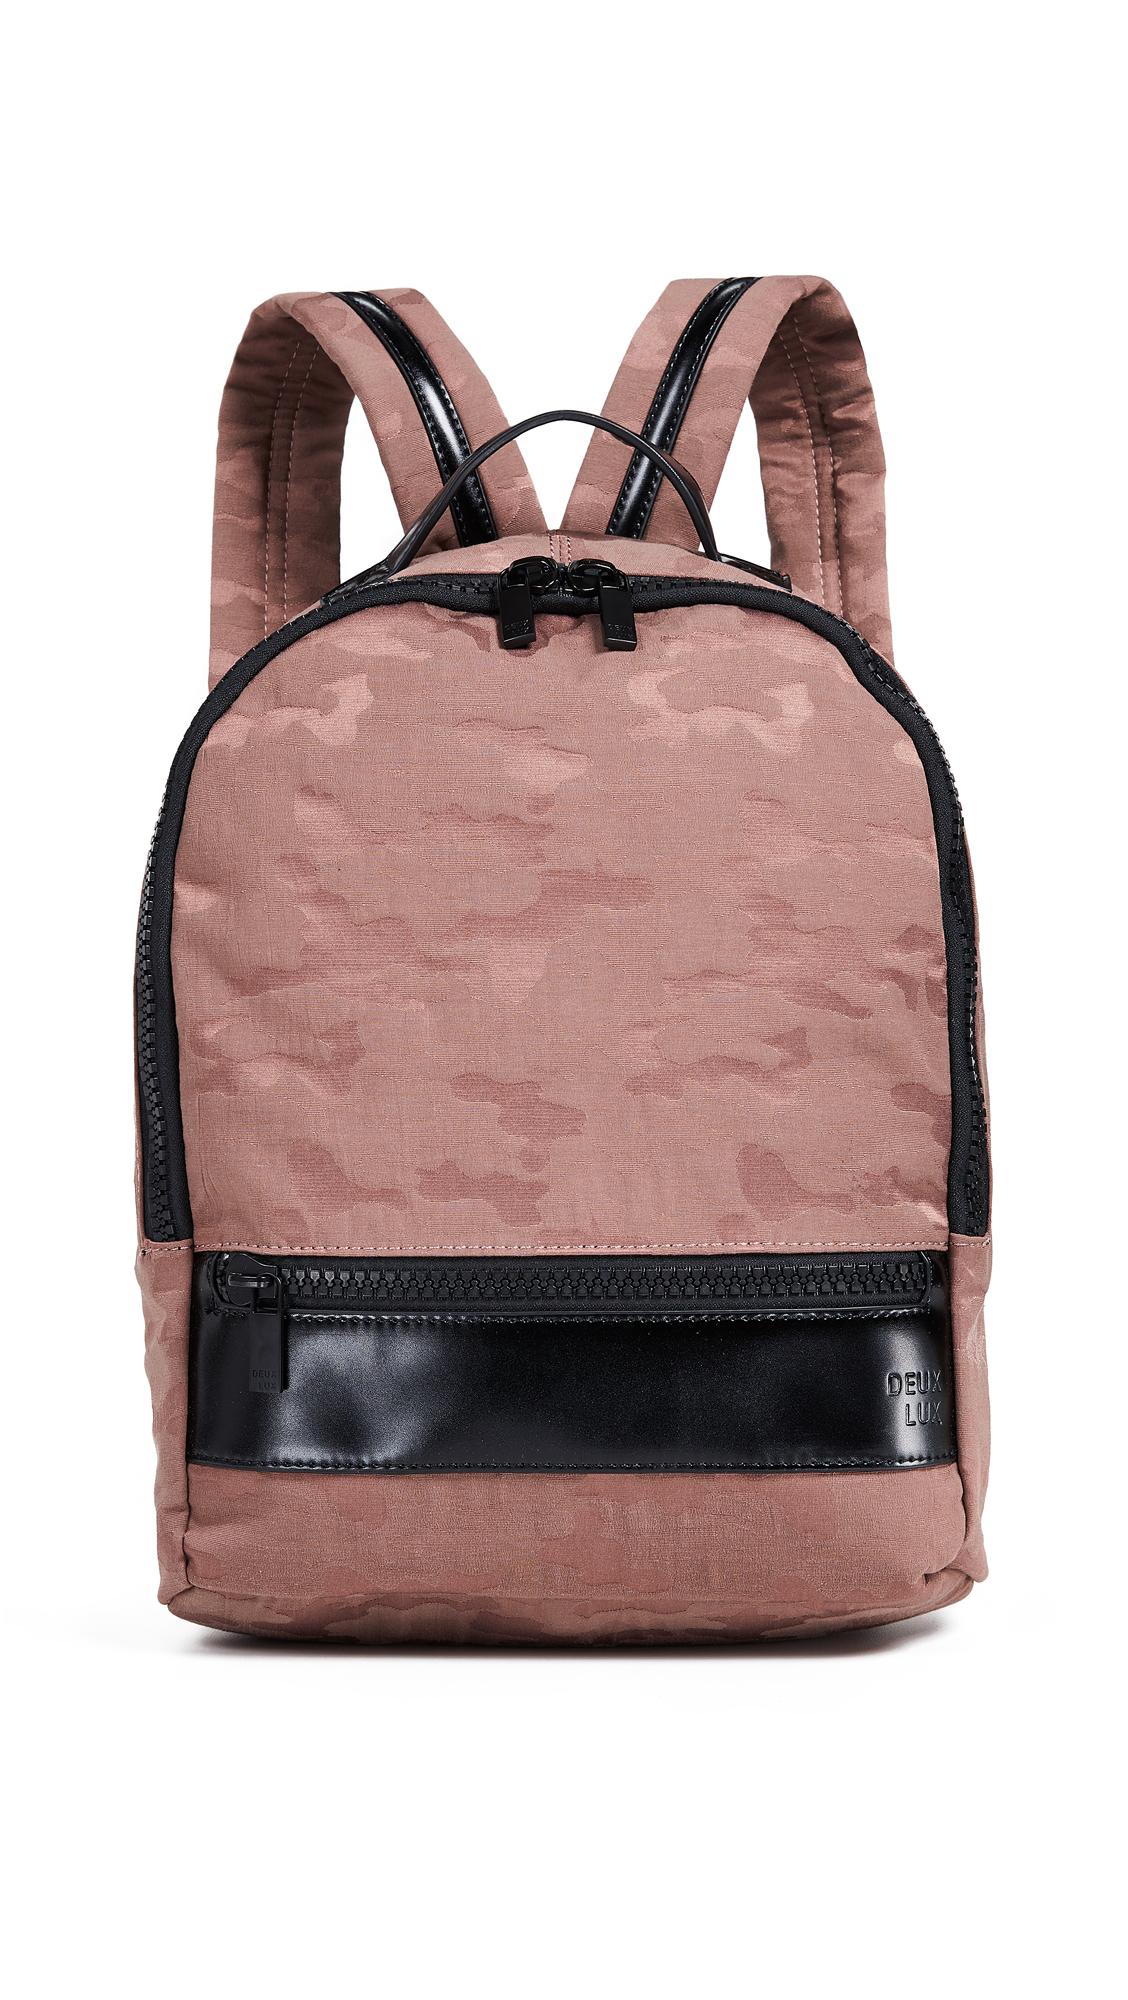 DEUX LUX Flow Backpack in Blush